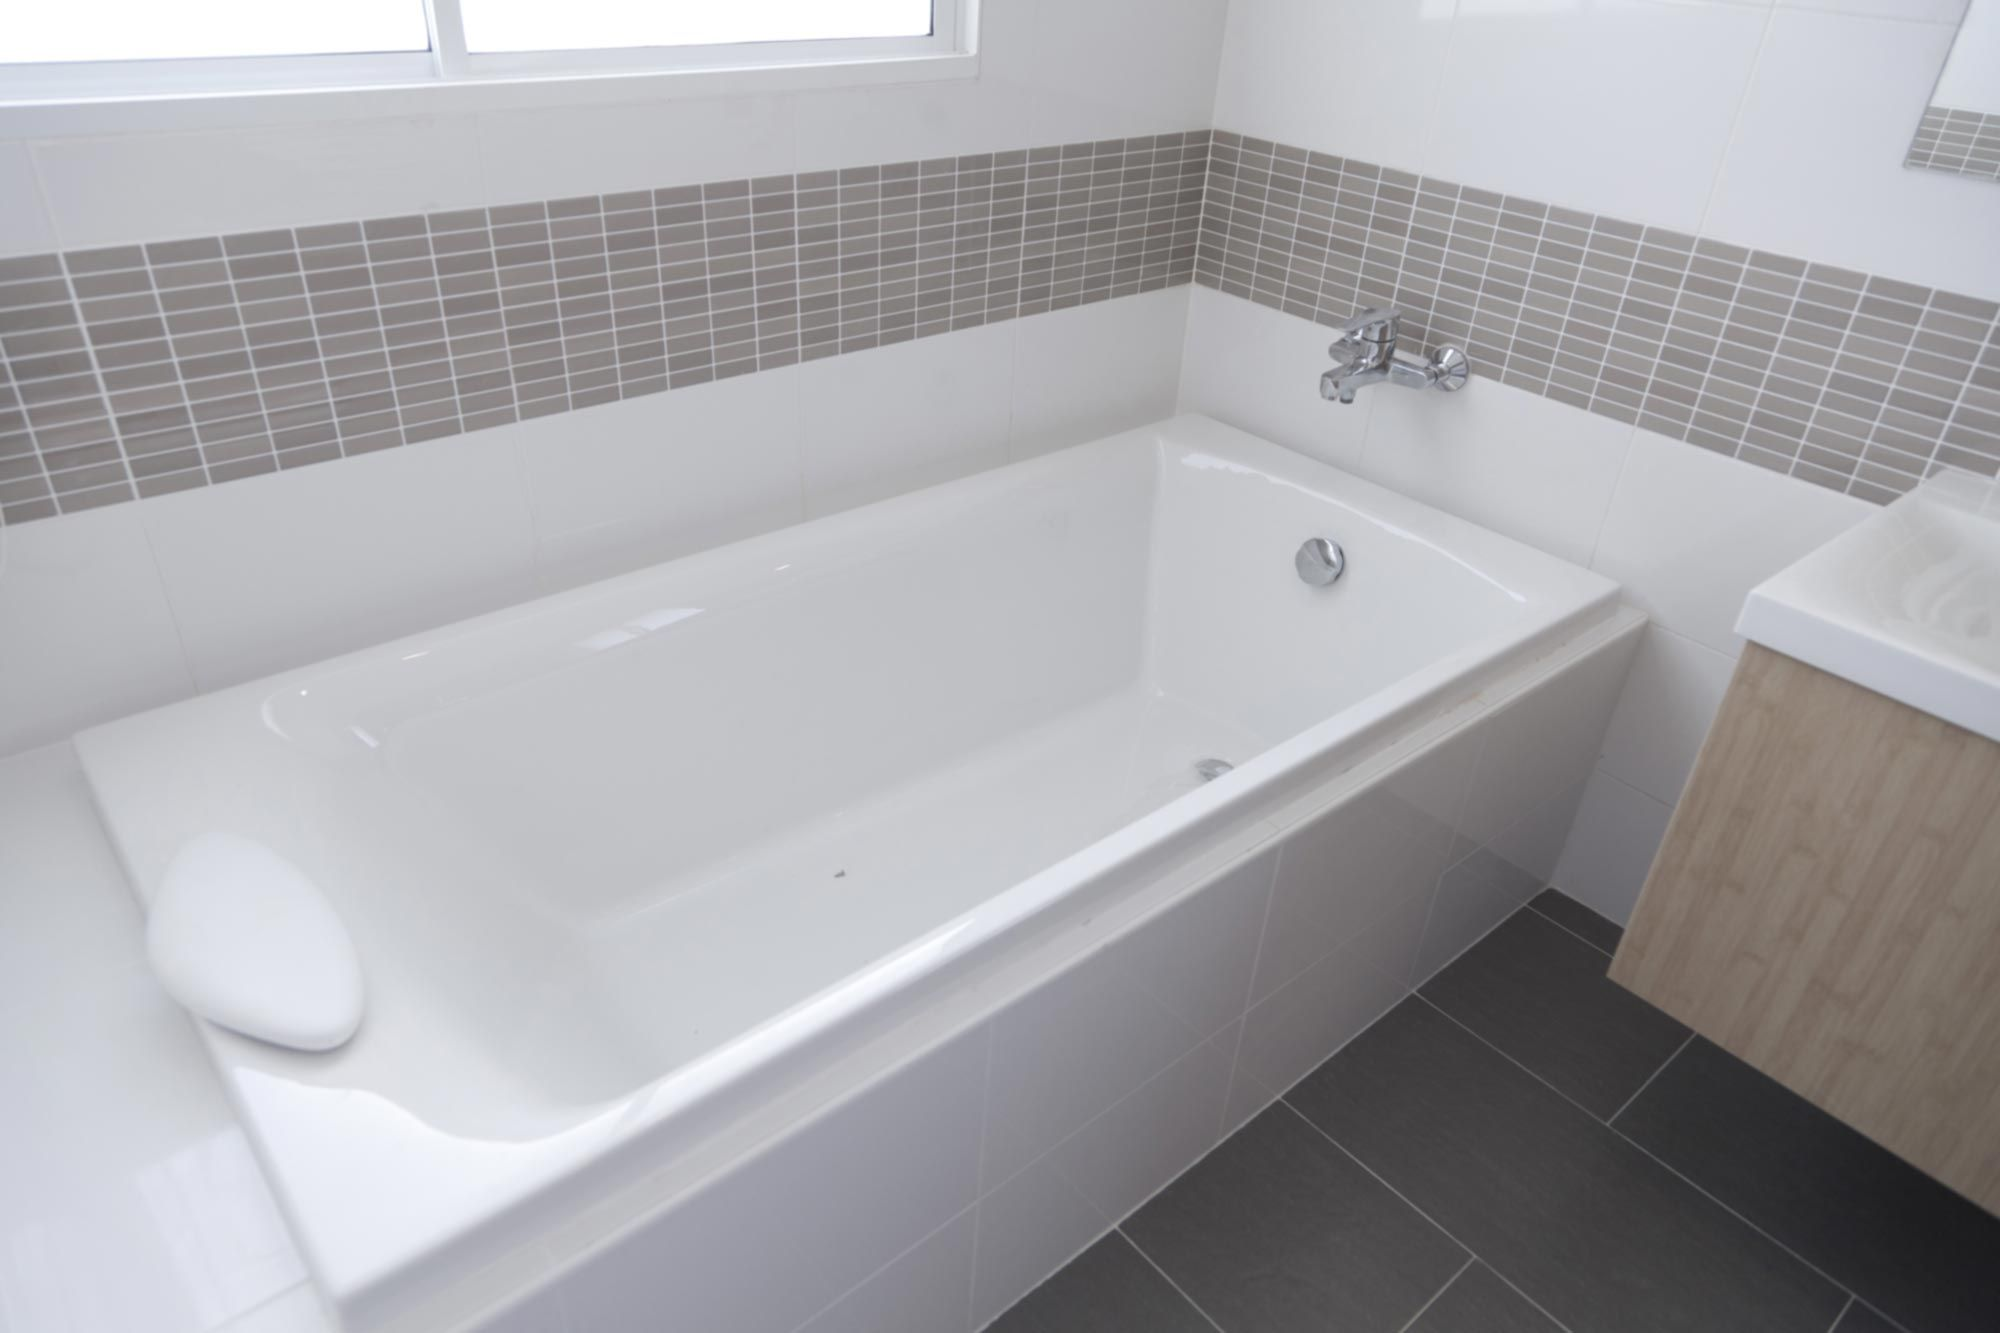 Bathtub Refinishing In The Tri State Area Ny Nj Ct Bathtub